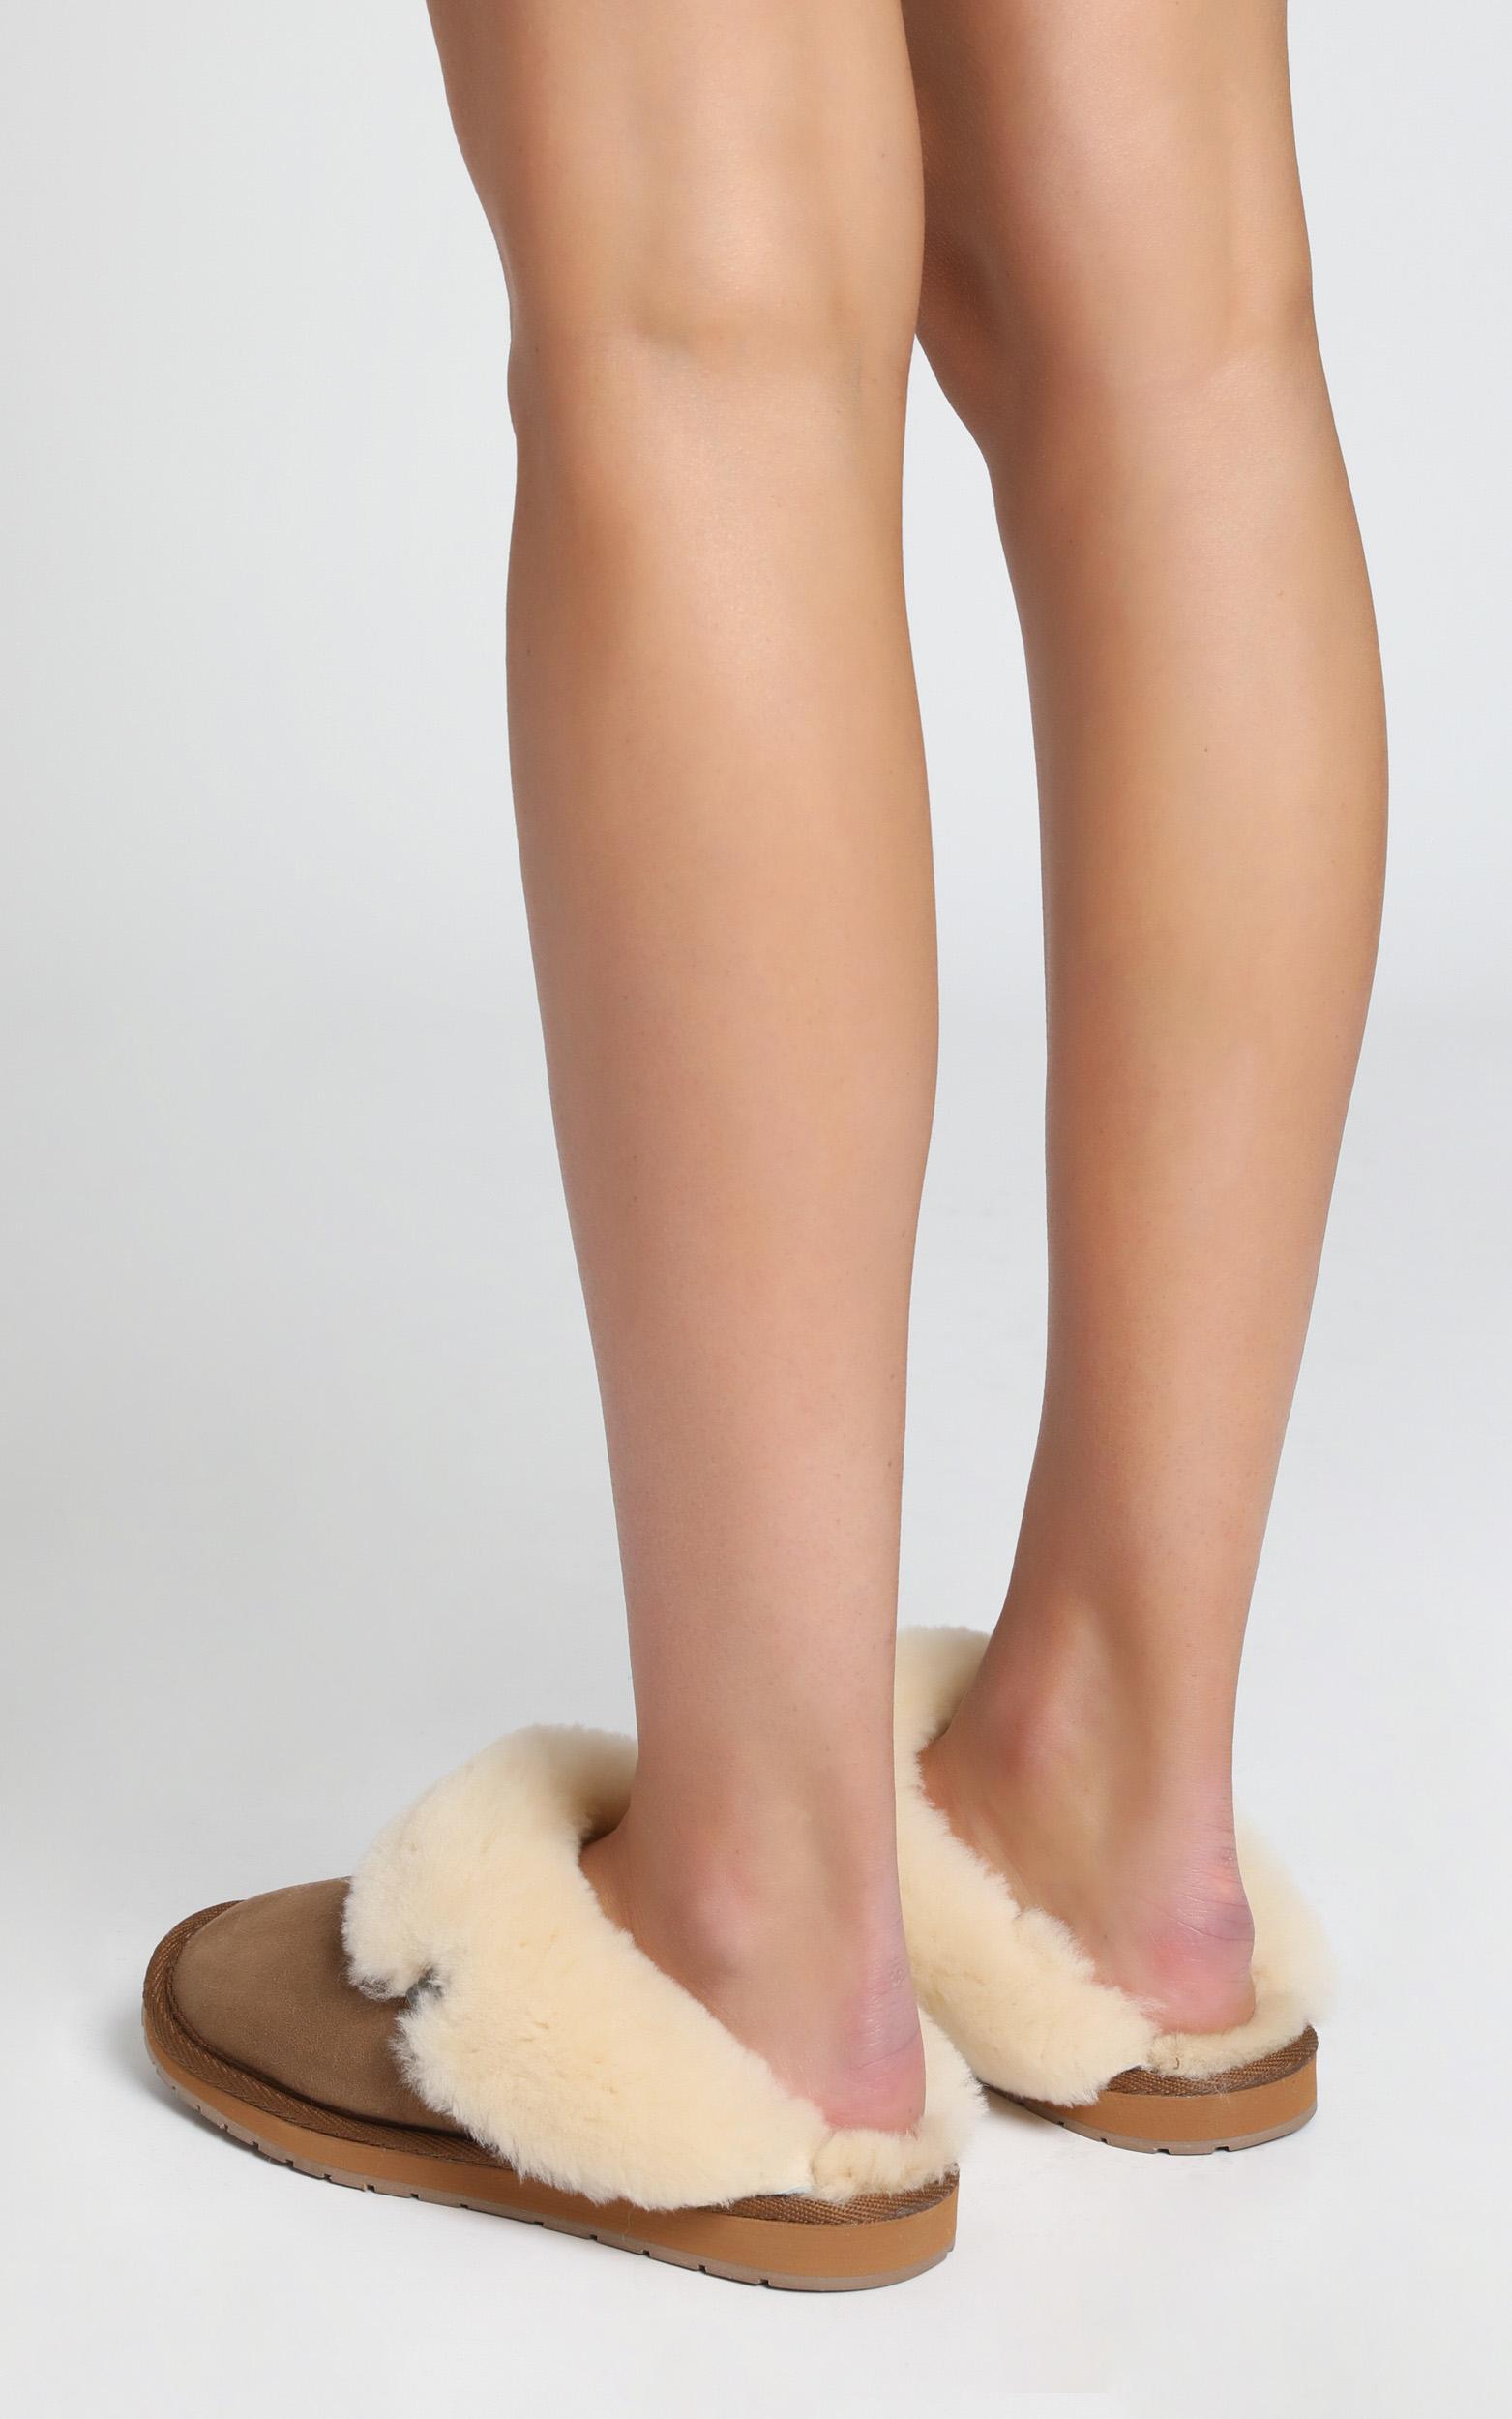 EMU Australia - Platinum Eden Slippers in Chestnut - 5, Camel, hi-res image number null